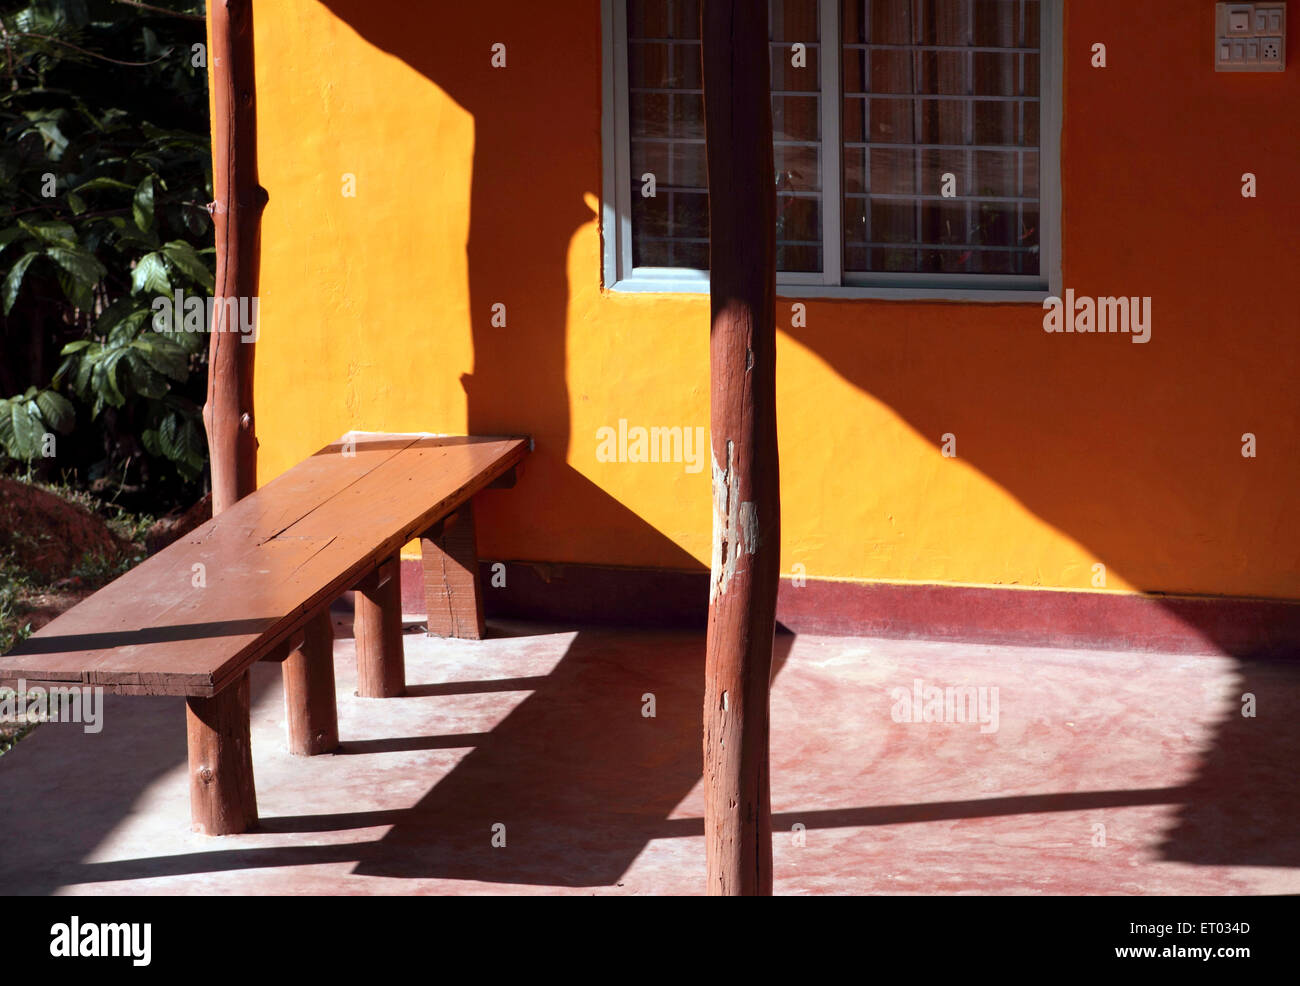 Veranda ; Madikeri ; Coorg ; Karnataka ; India 23 December 2008 - Stock Image